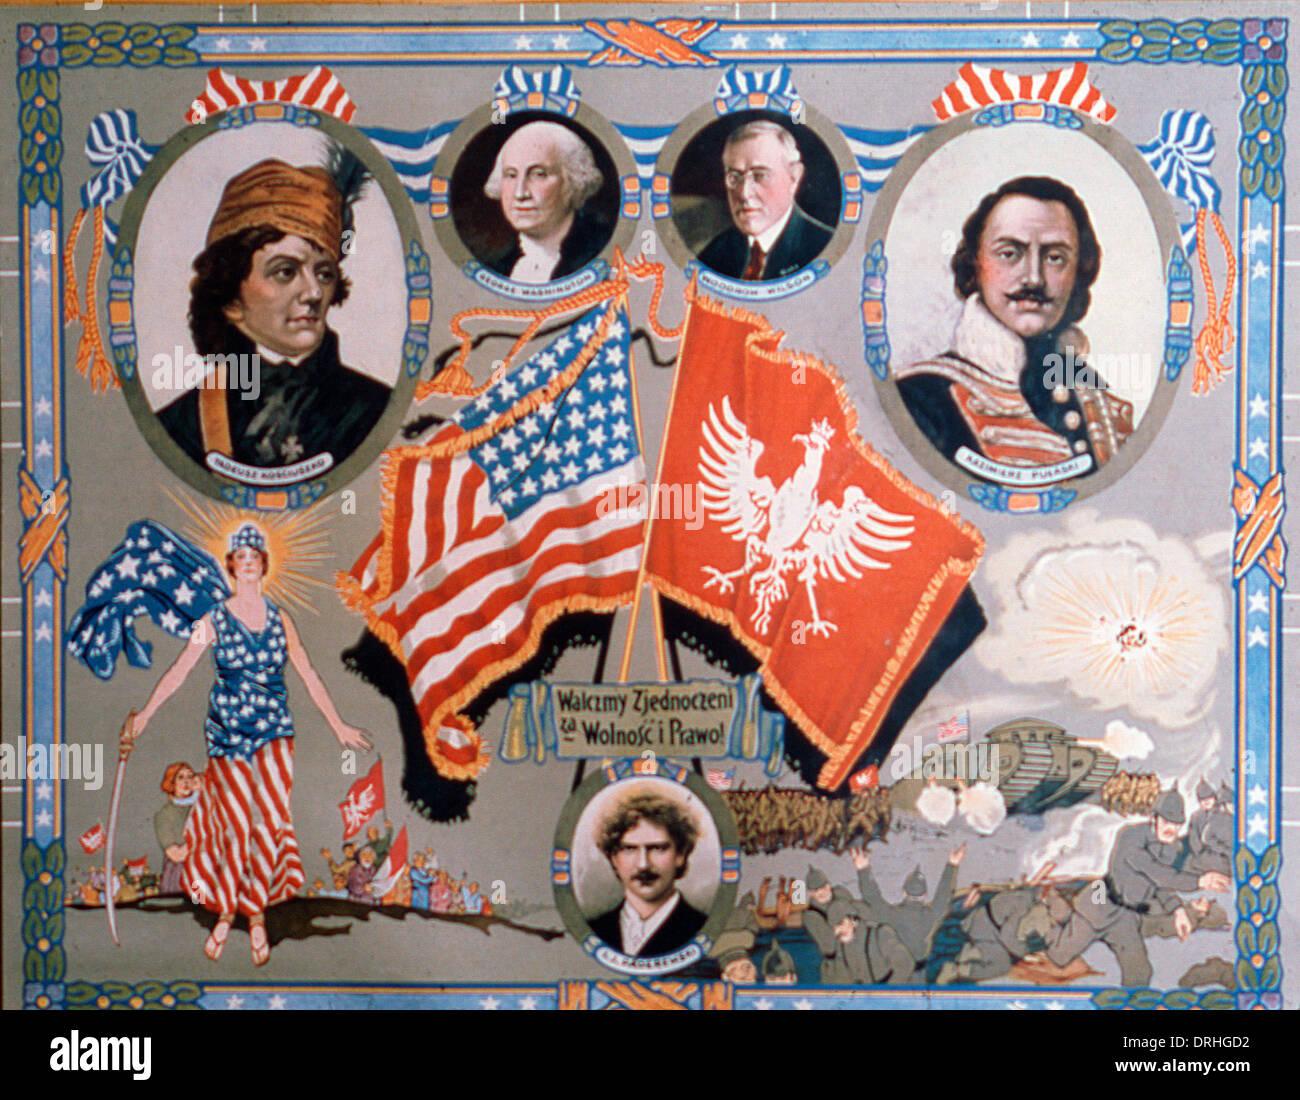 Polnisch-amerikanischen Plakat, geeint im Kampf, WW1 Stockbild